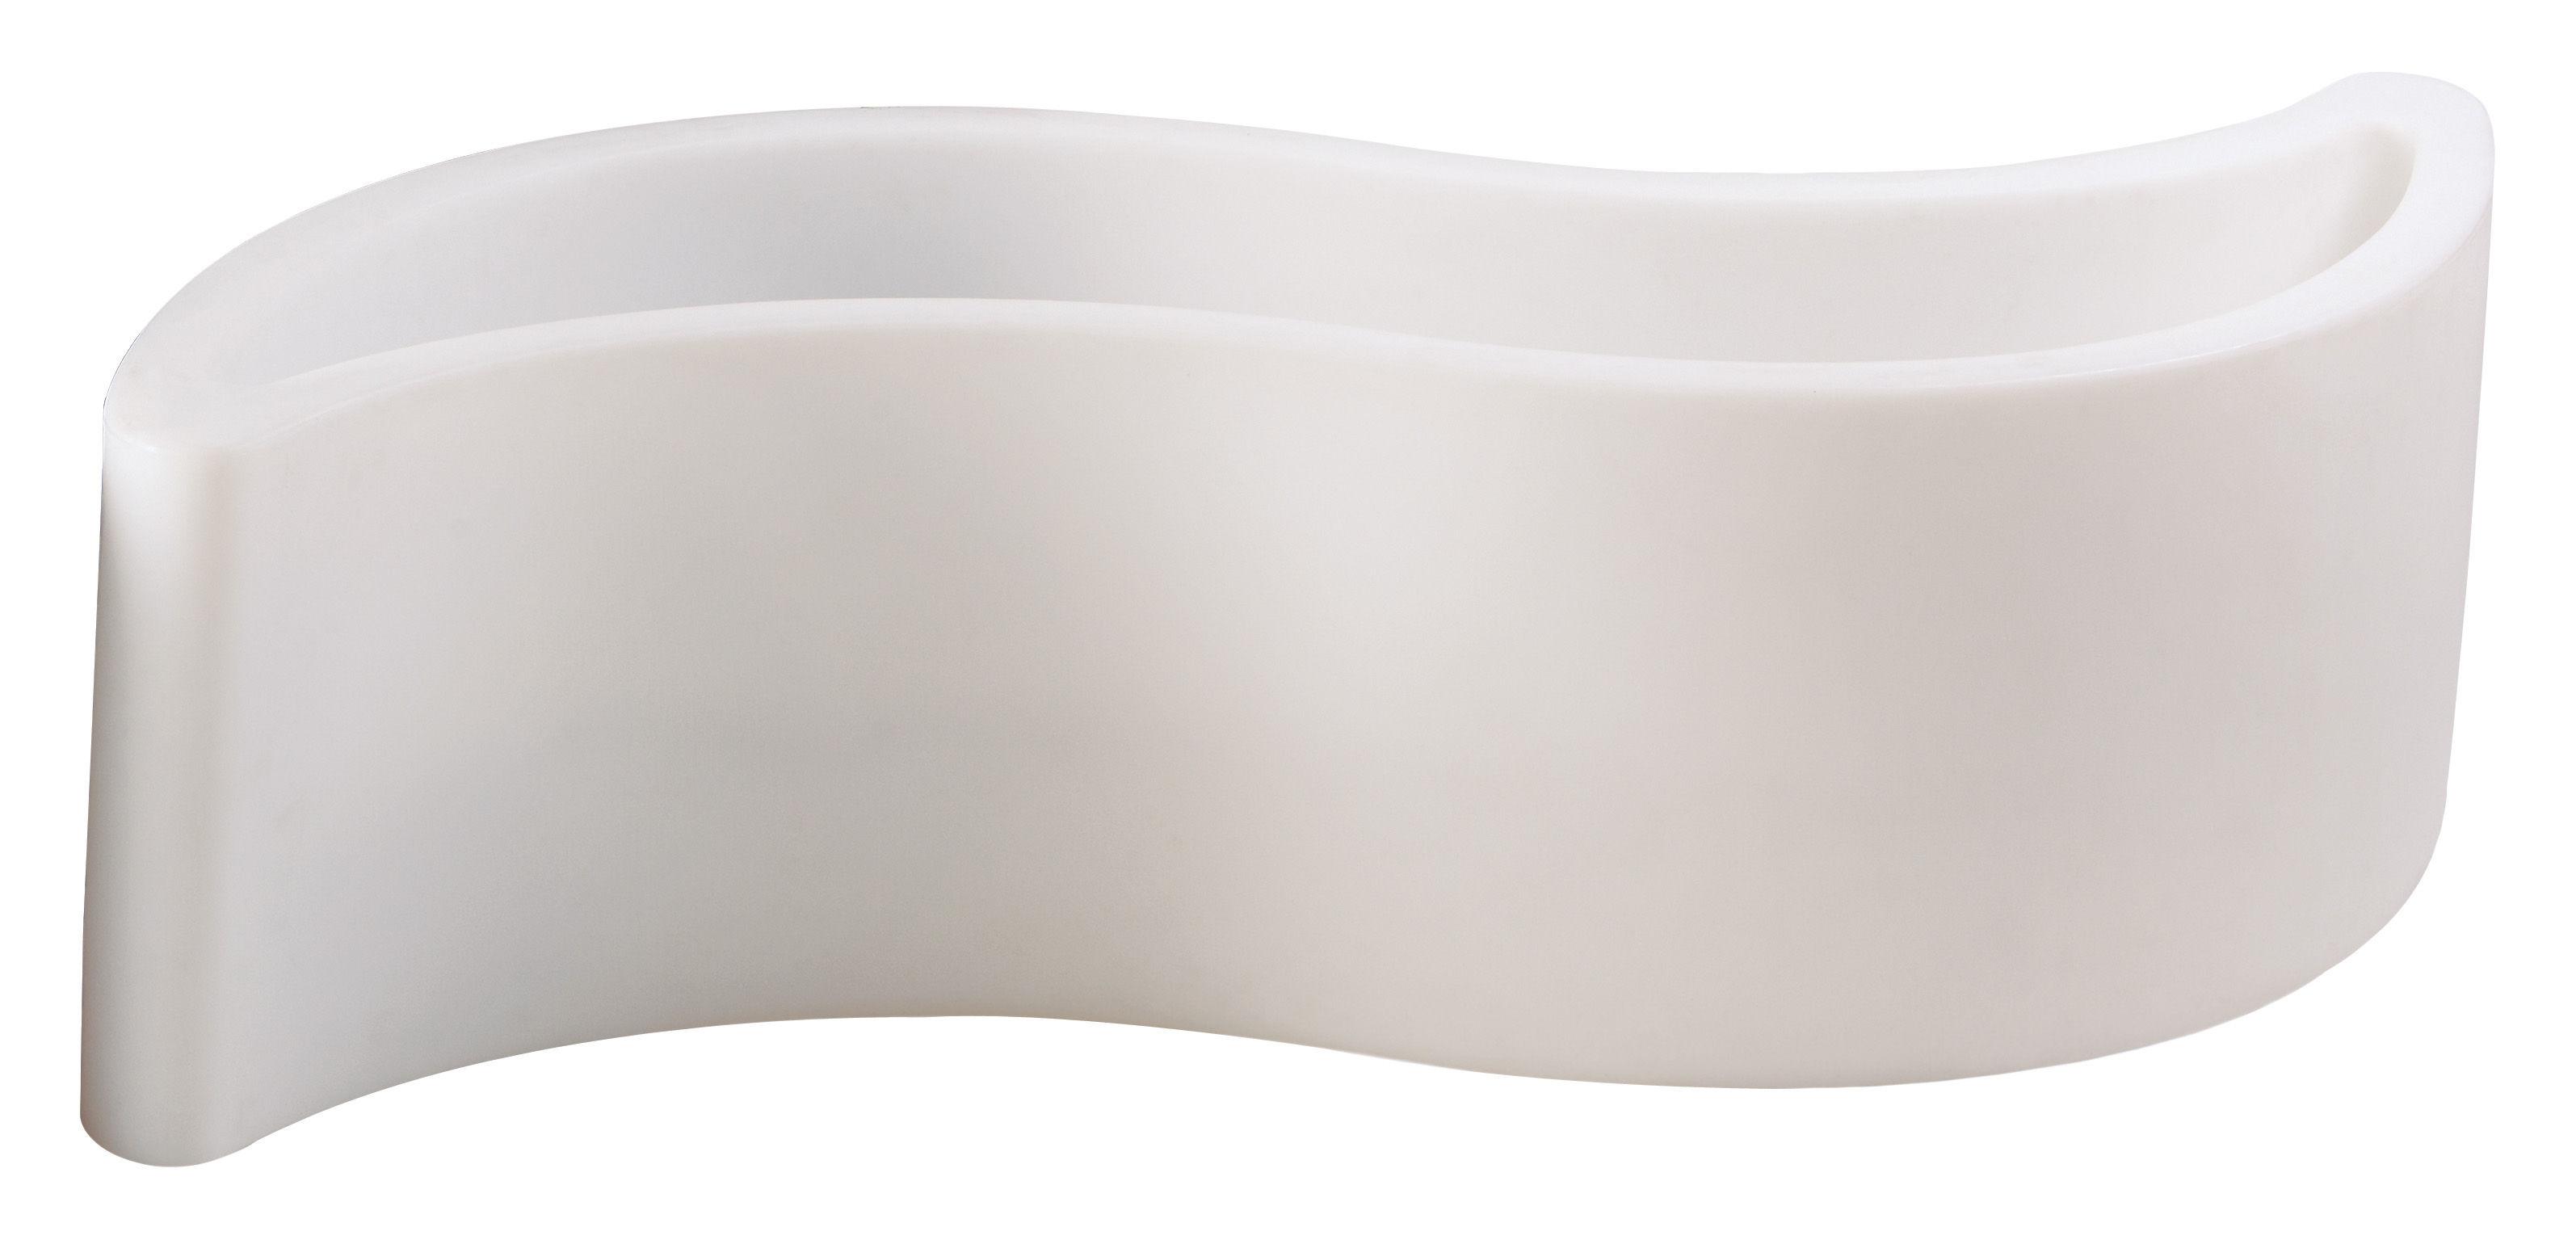 Arredamento - Panchine - Fioriera Wave - /Panchetta di Slide - Bianco - polyéthène recyclable